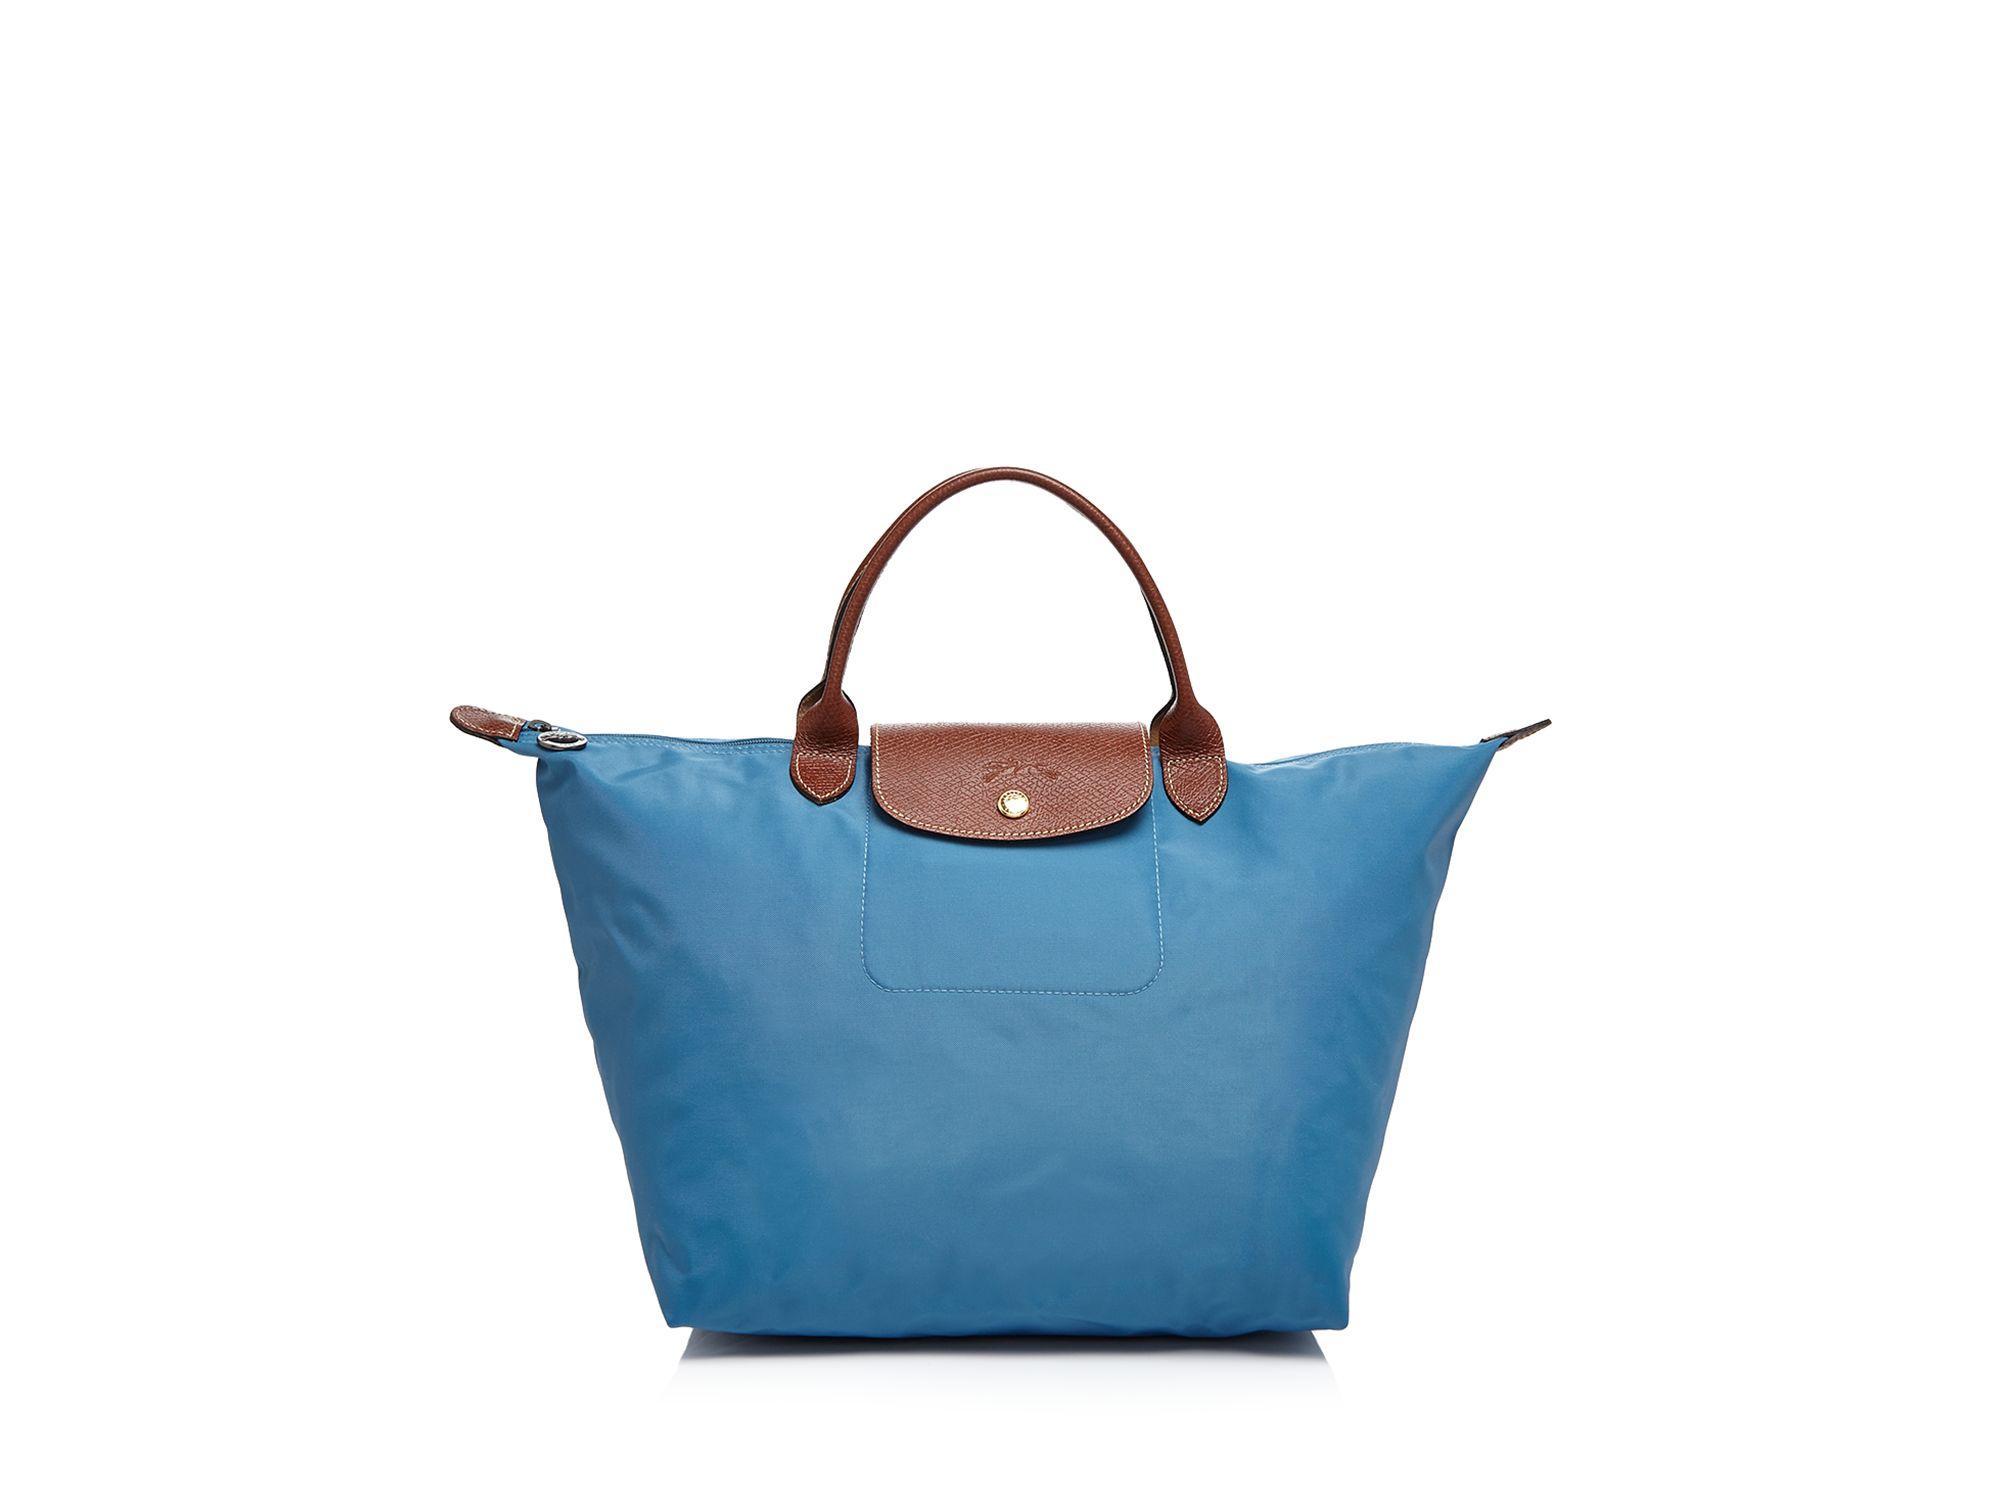 272146238b4 Lyst - Longchamp Tote - Le Pliage Medium Handheld in Blue